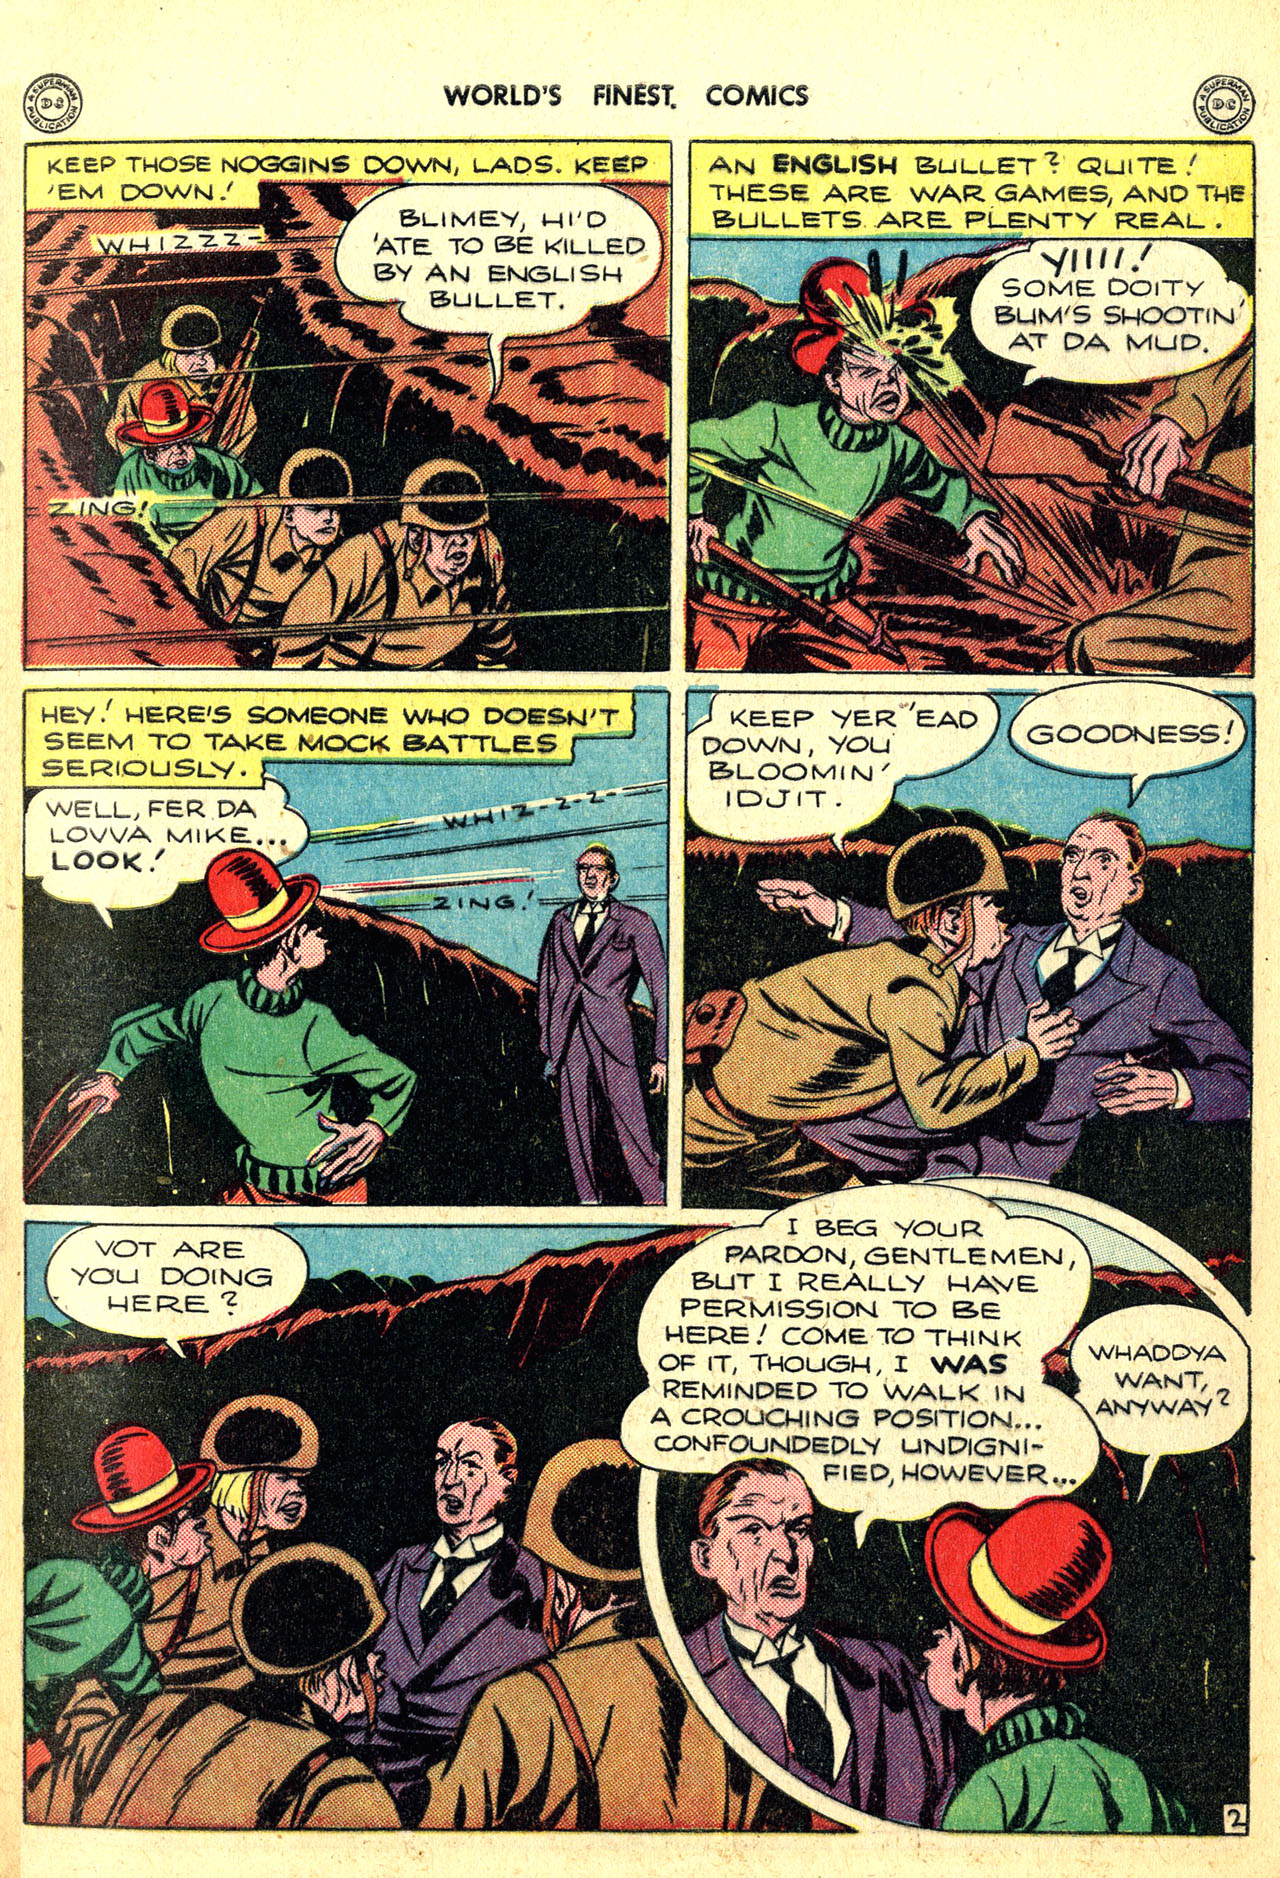 Read online World's Finest Comics comic -  Issue #18 - 37